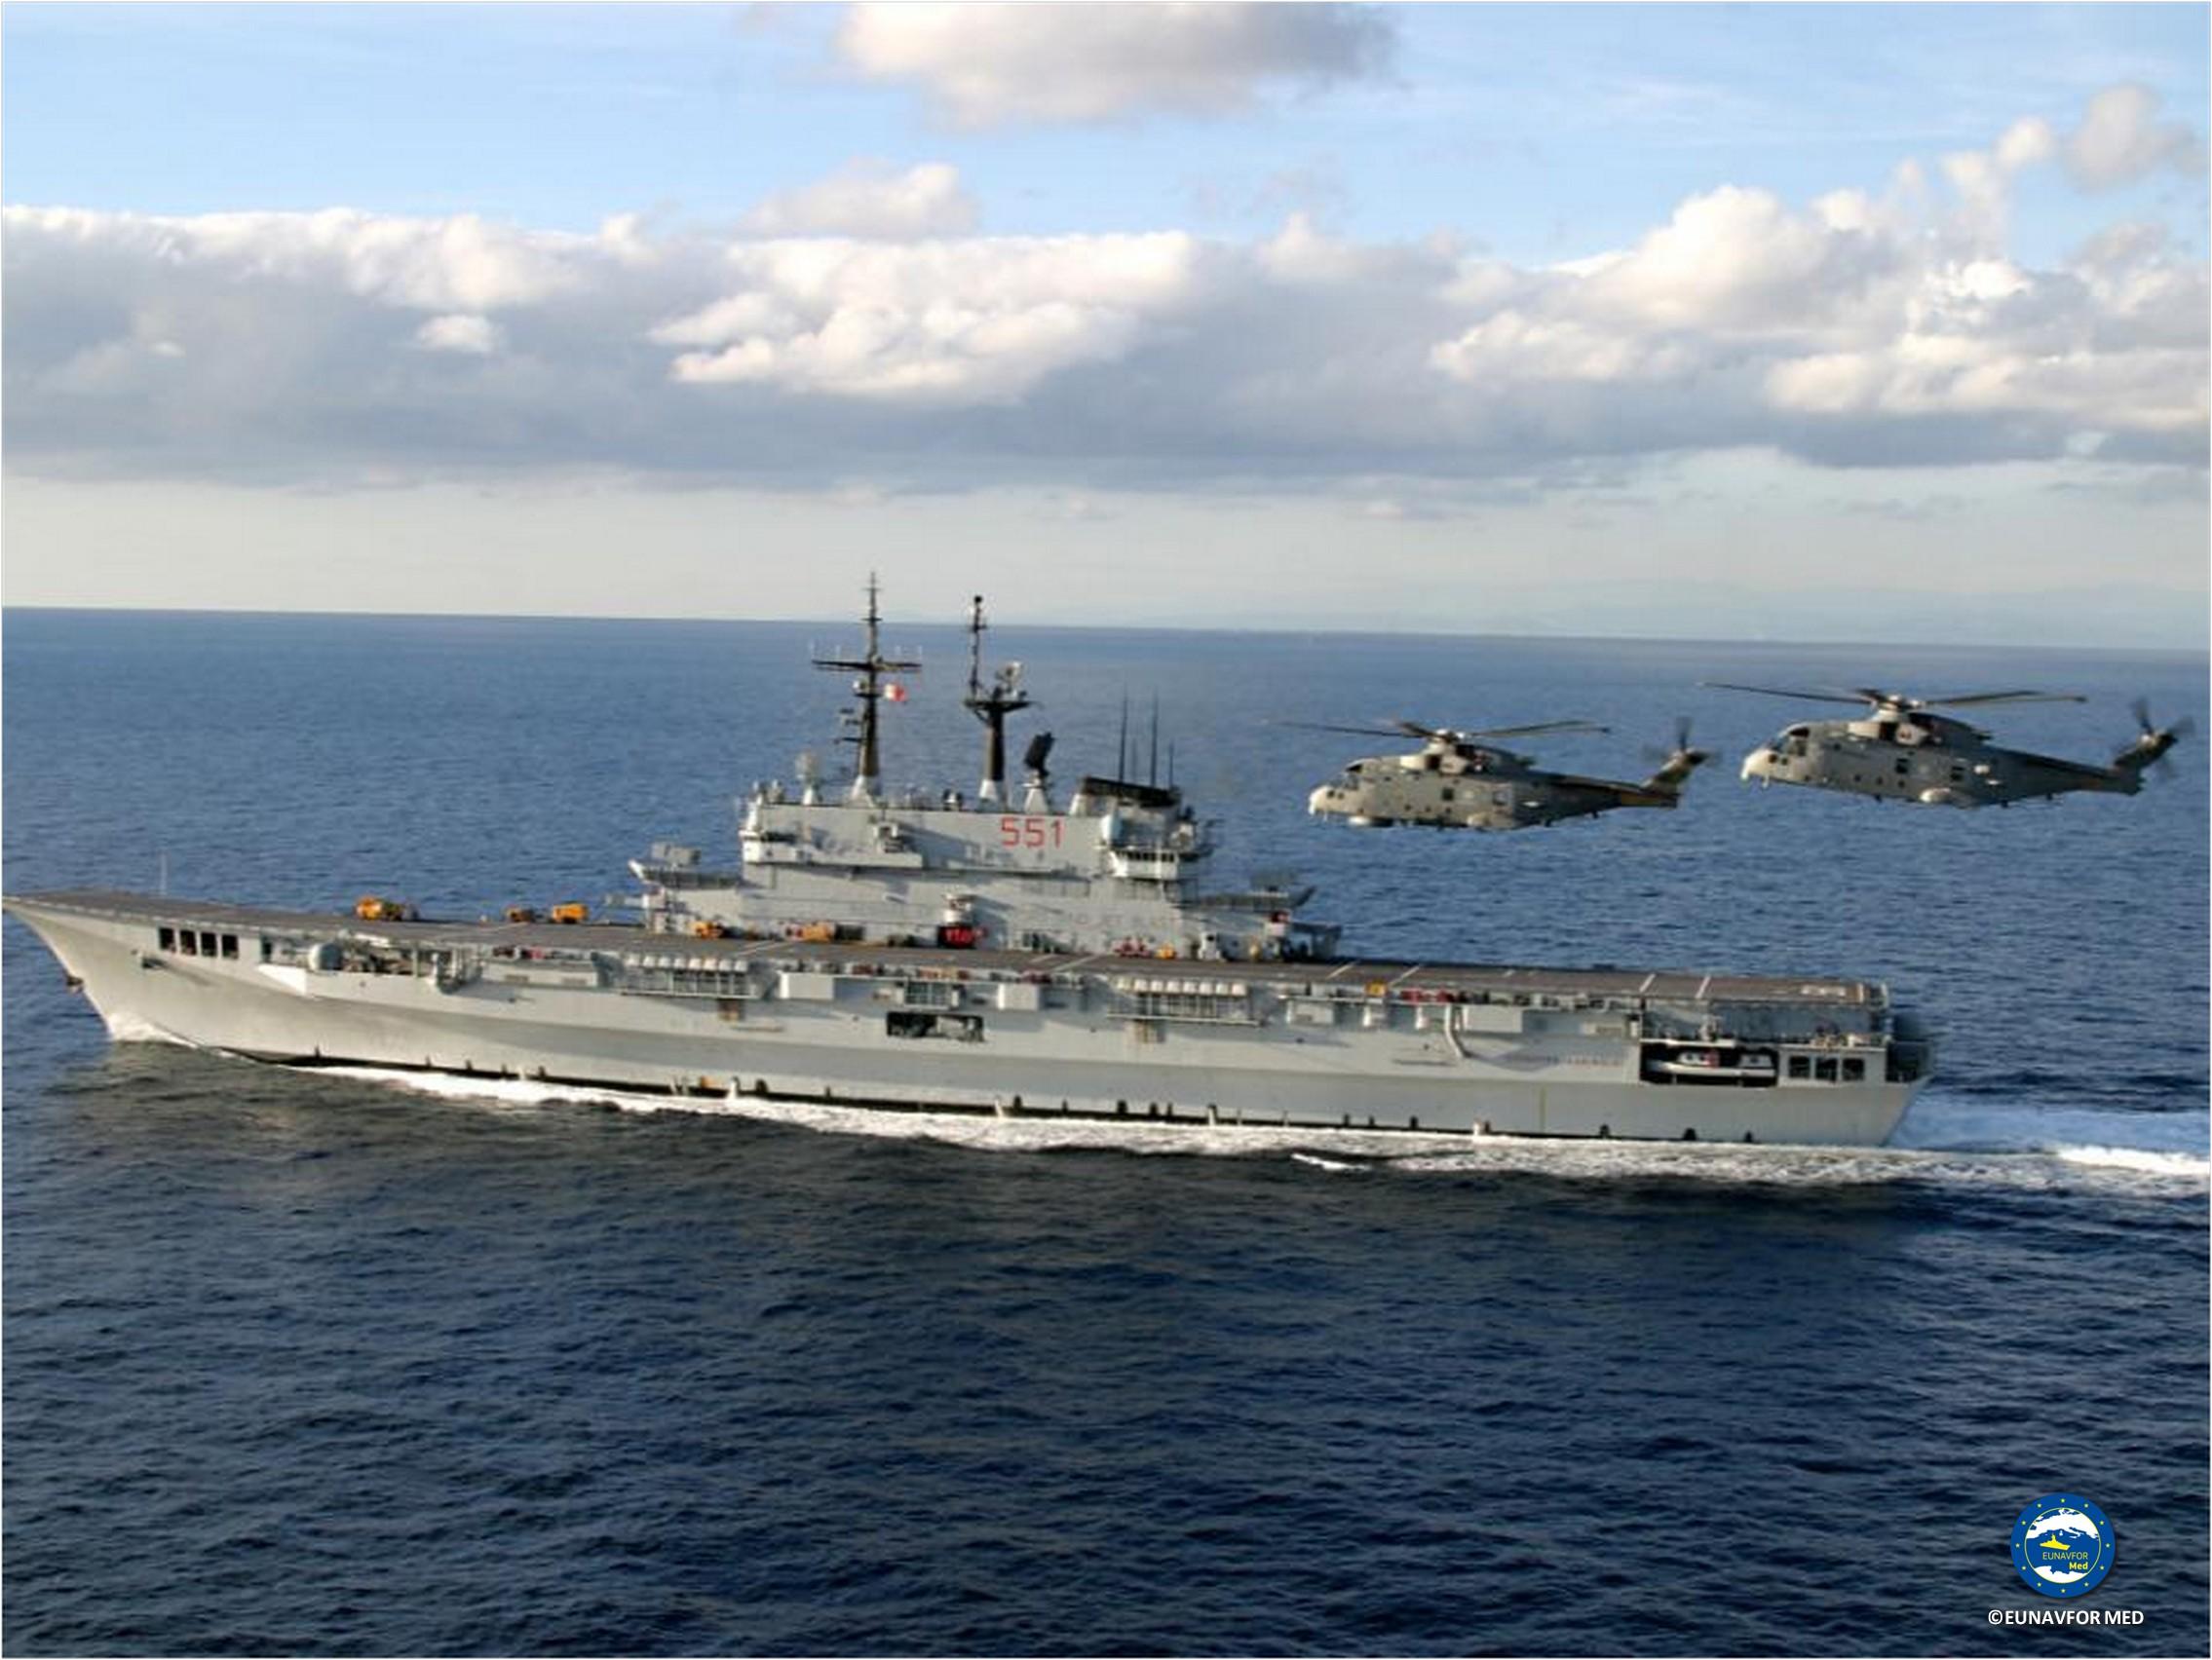 Operazione eunavformed la portaeromobili garibaldi - Nave portaerei ...